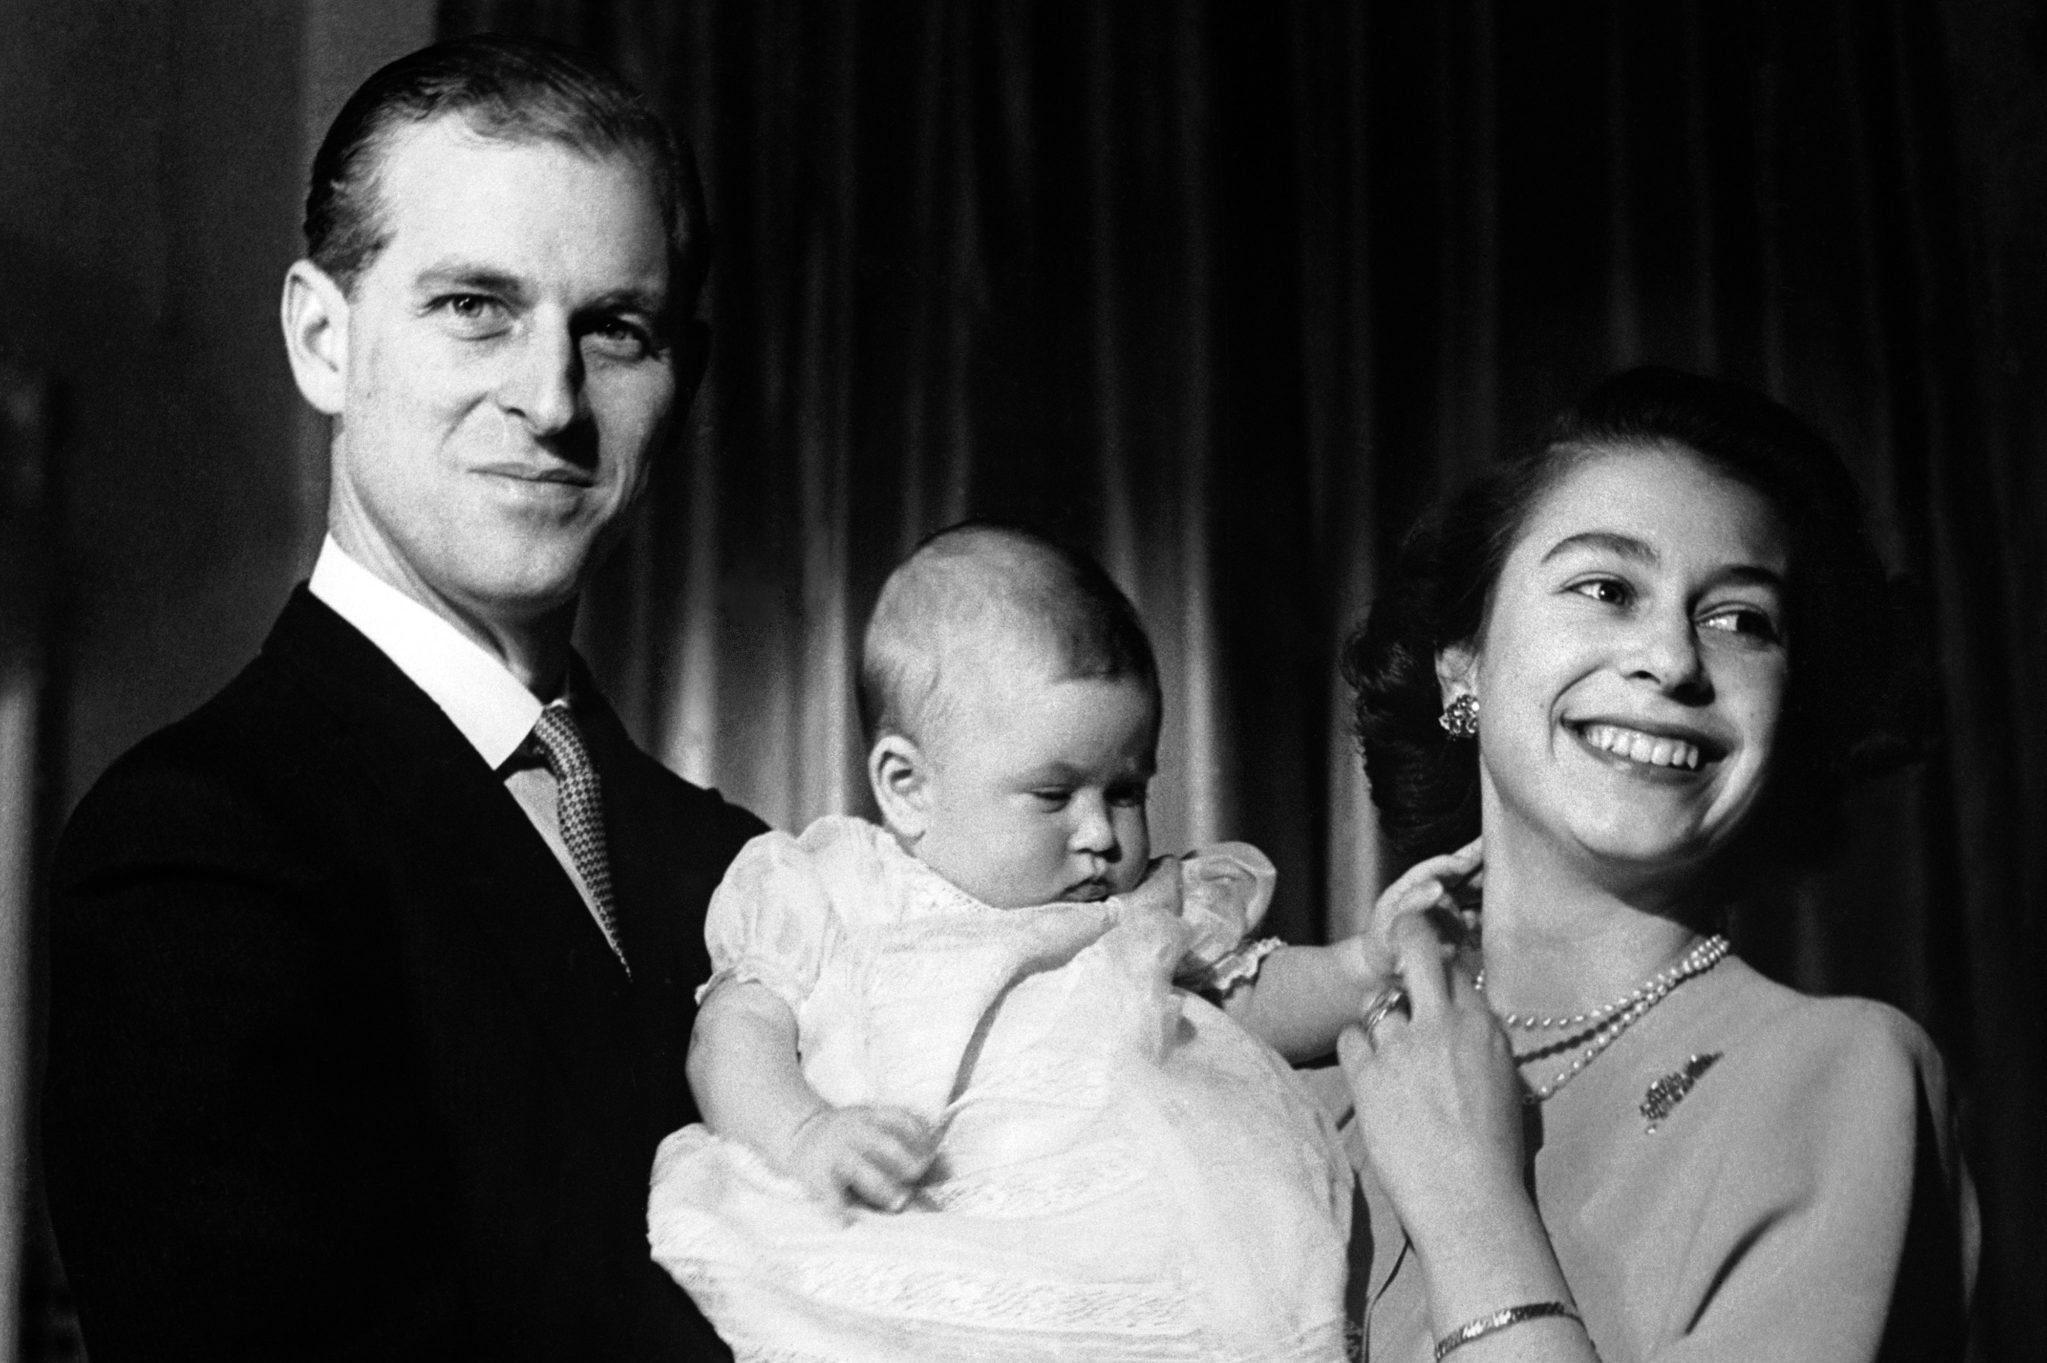 Princess Elizabeth and Duke of Edinburgh with Prince Charles - Buckingham Palace, London